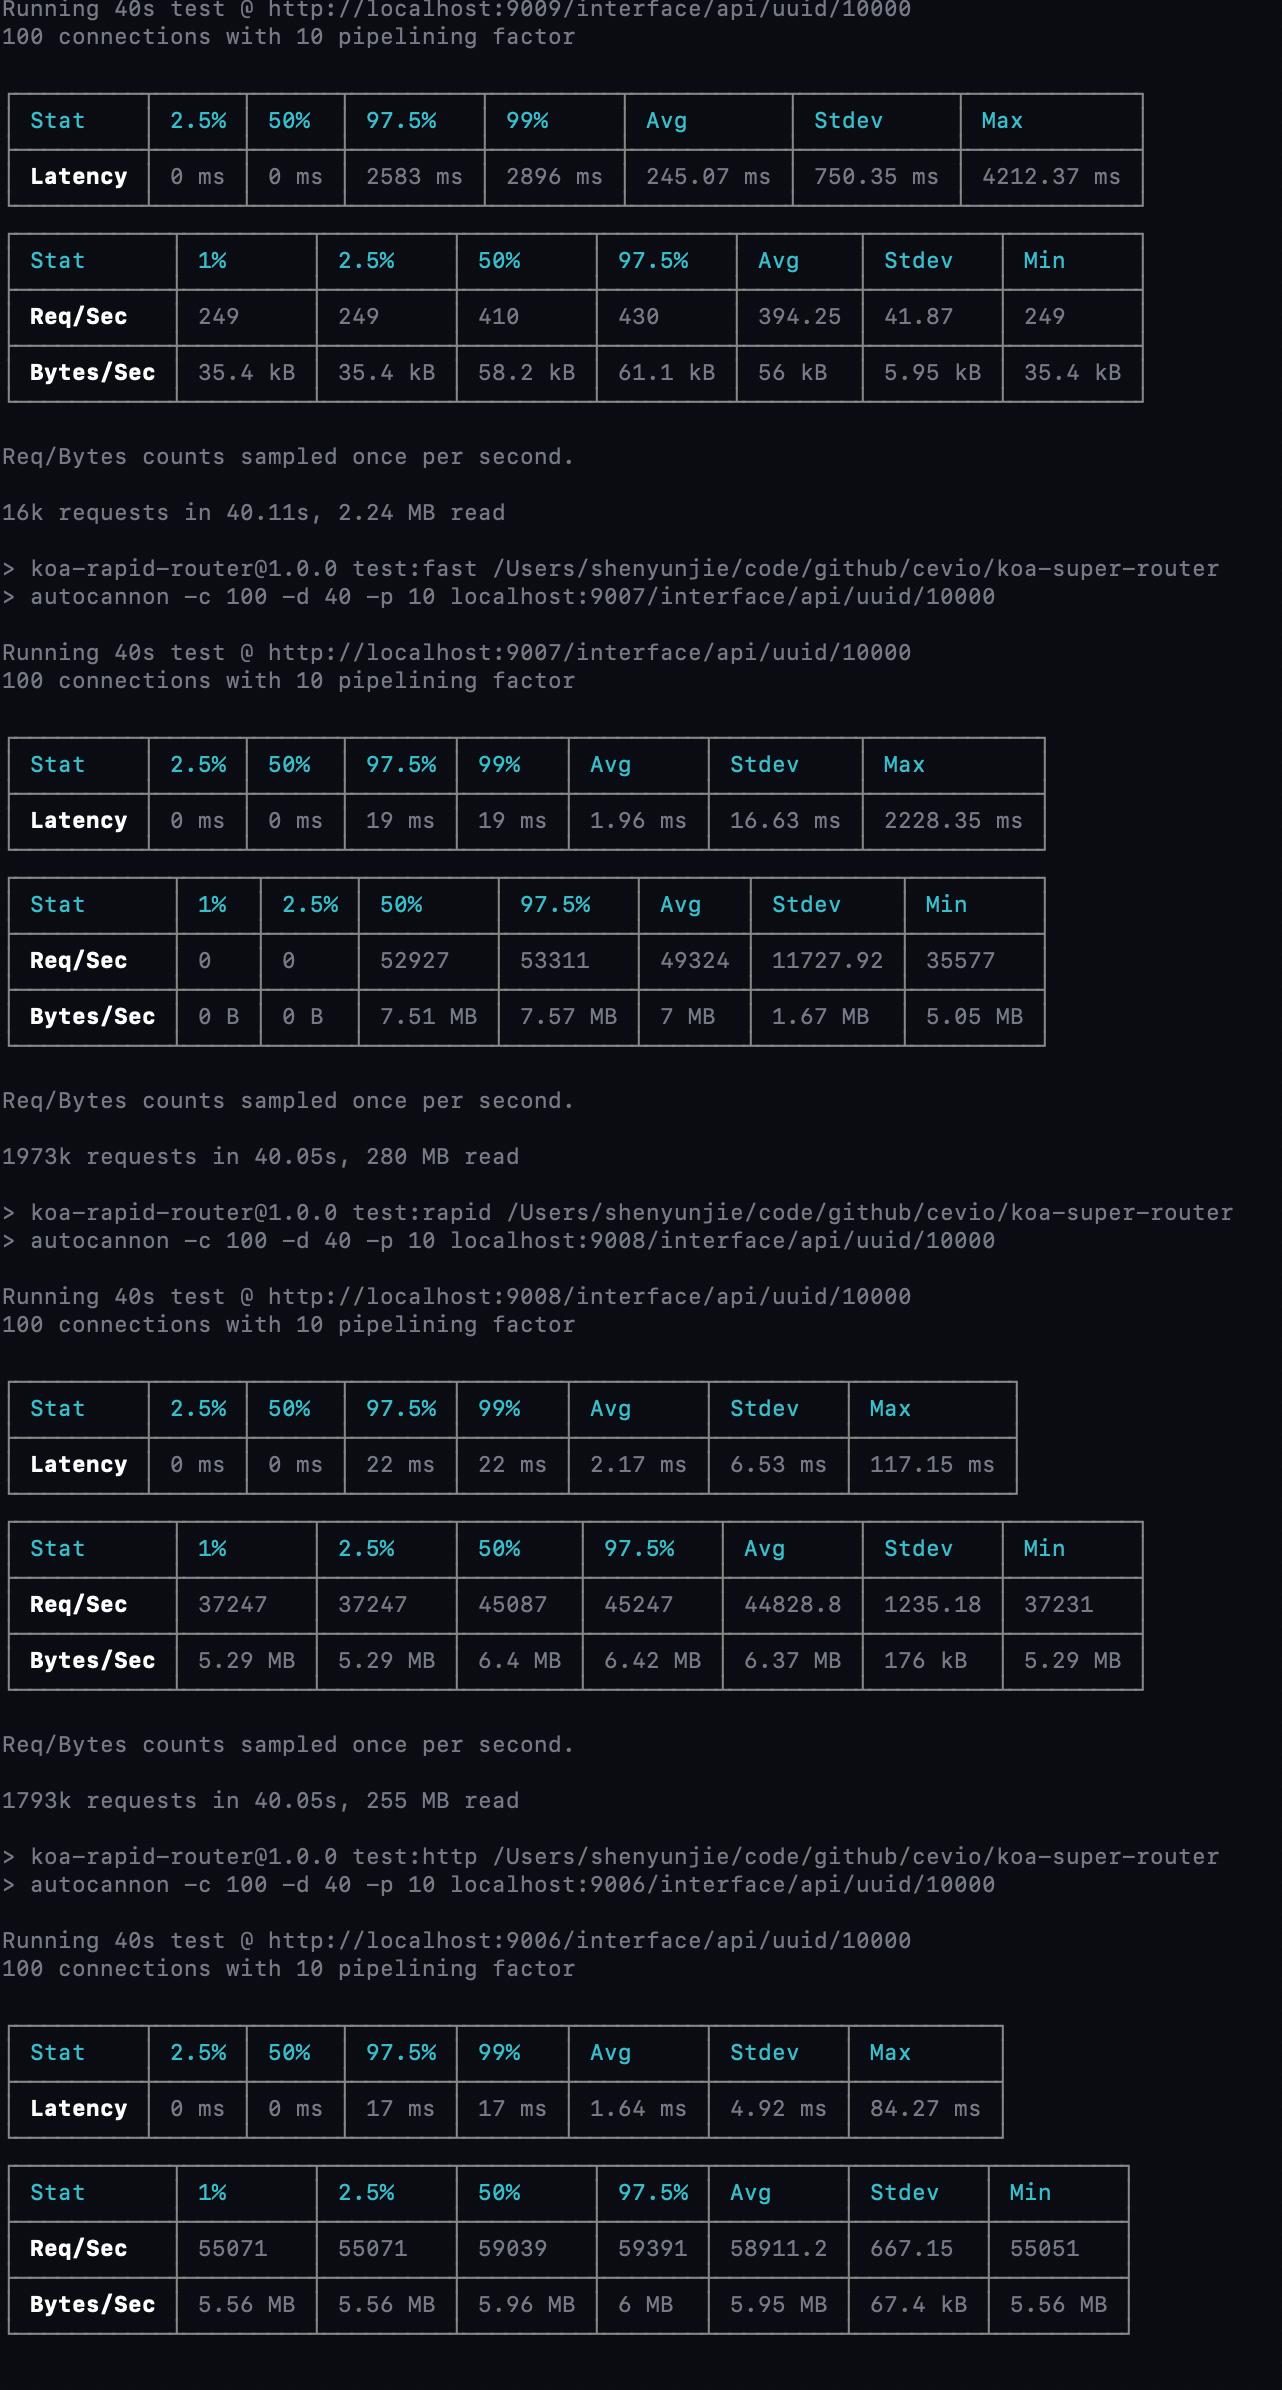 koa-rapid-router:static